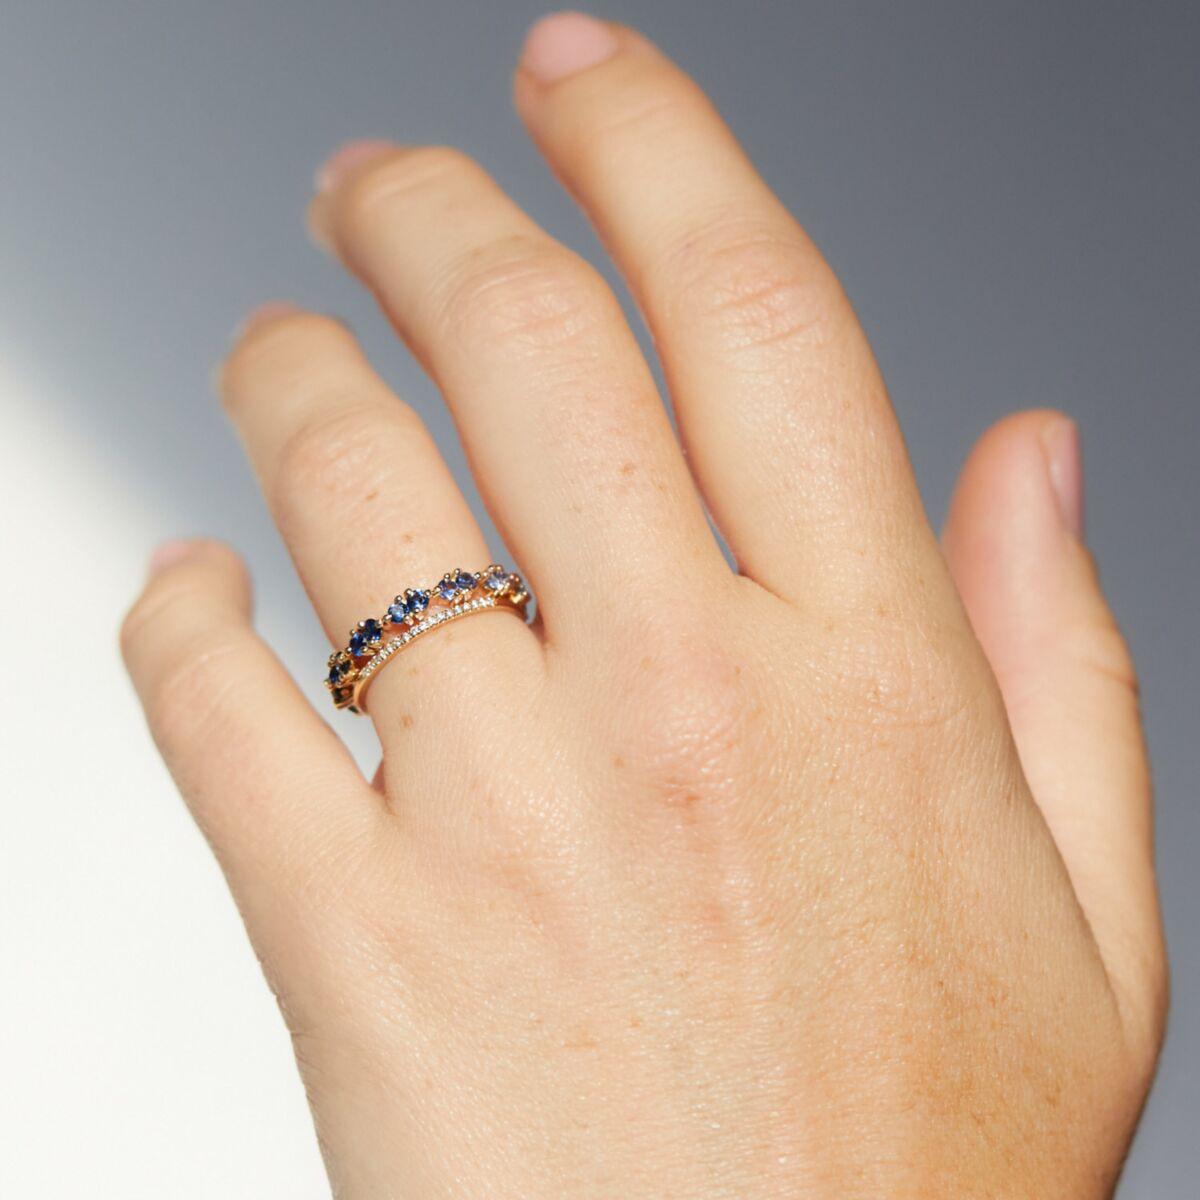 Pathway Eternity Ring (Gradient Blue Sapphire) image